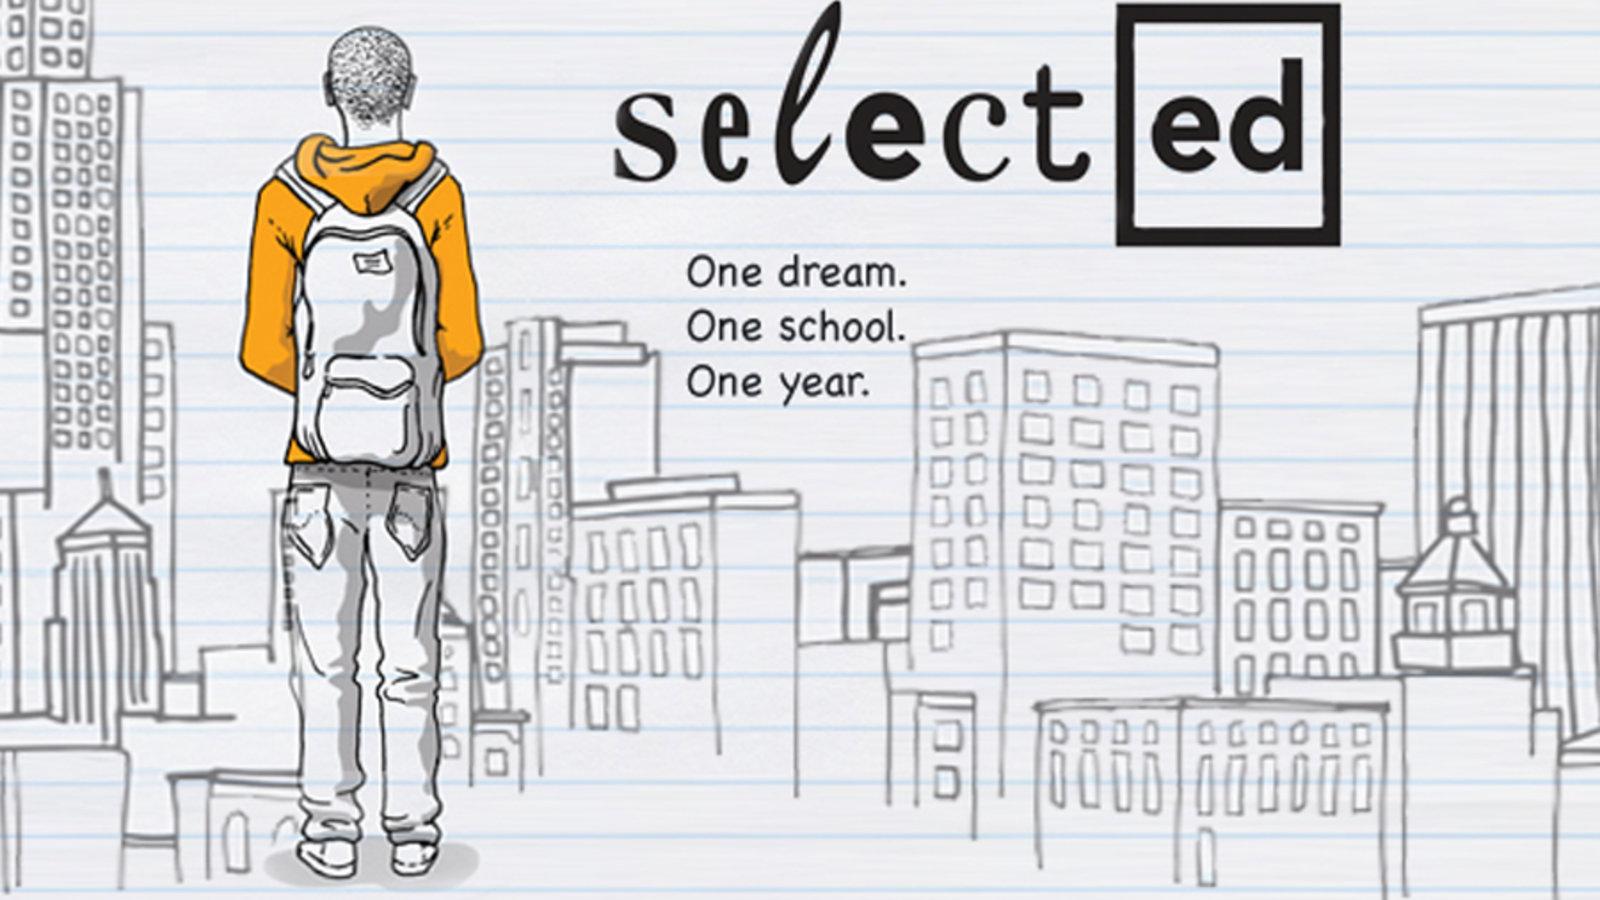 SelectED - Public Urban Education